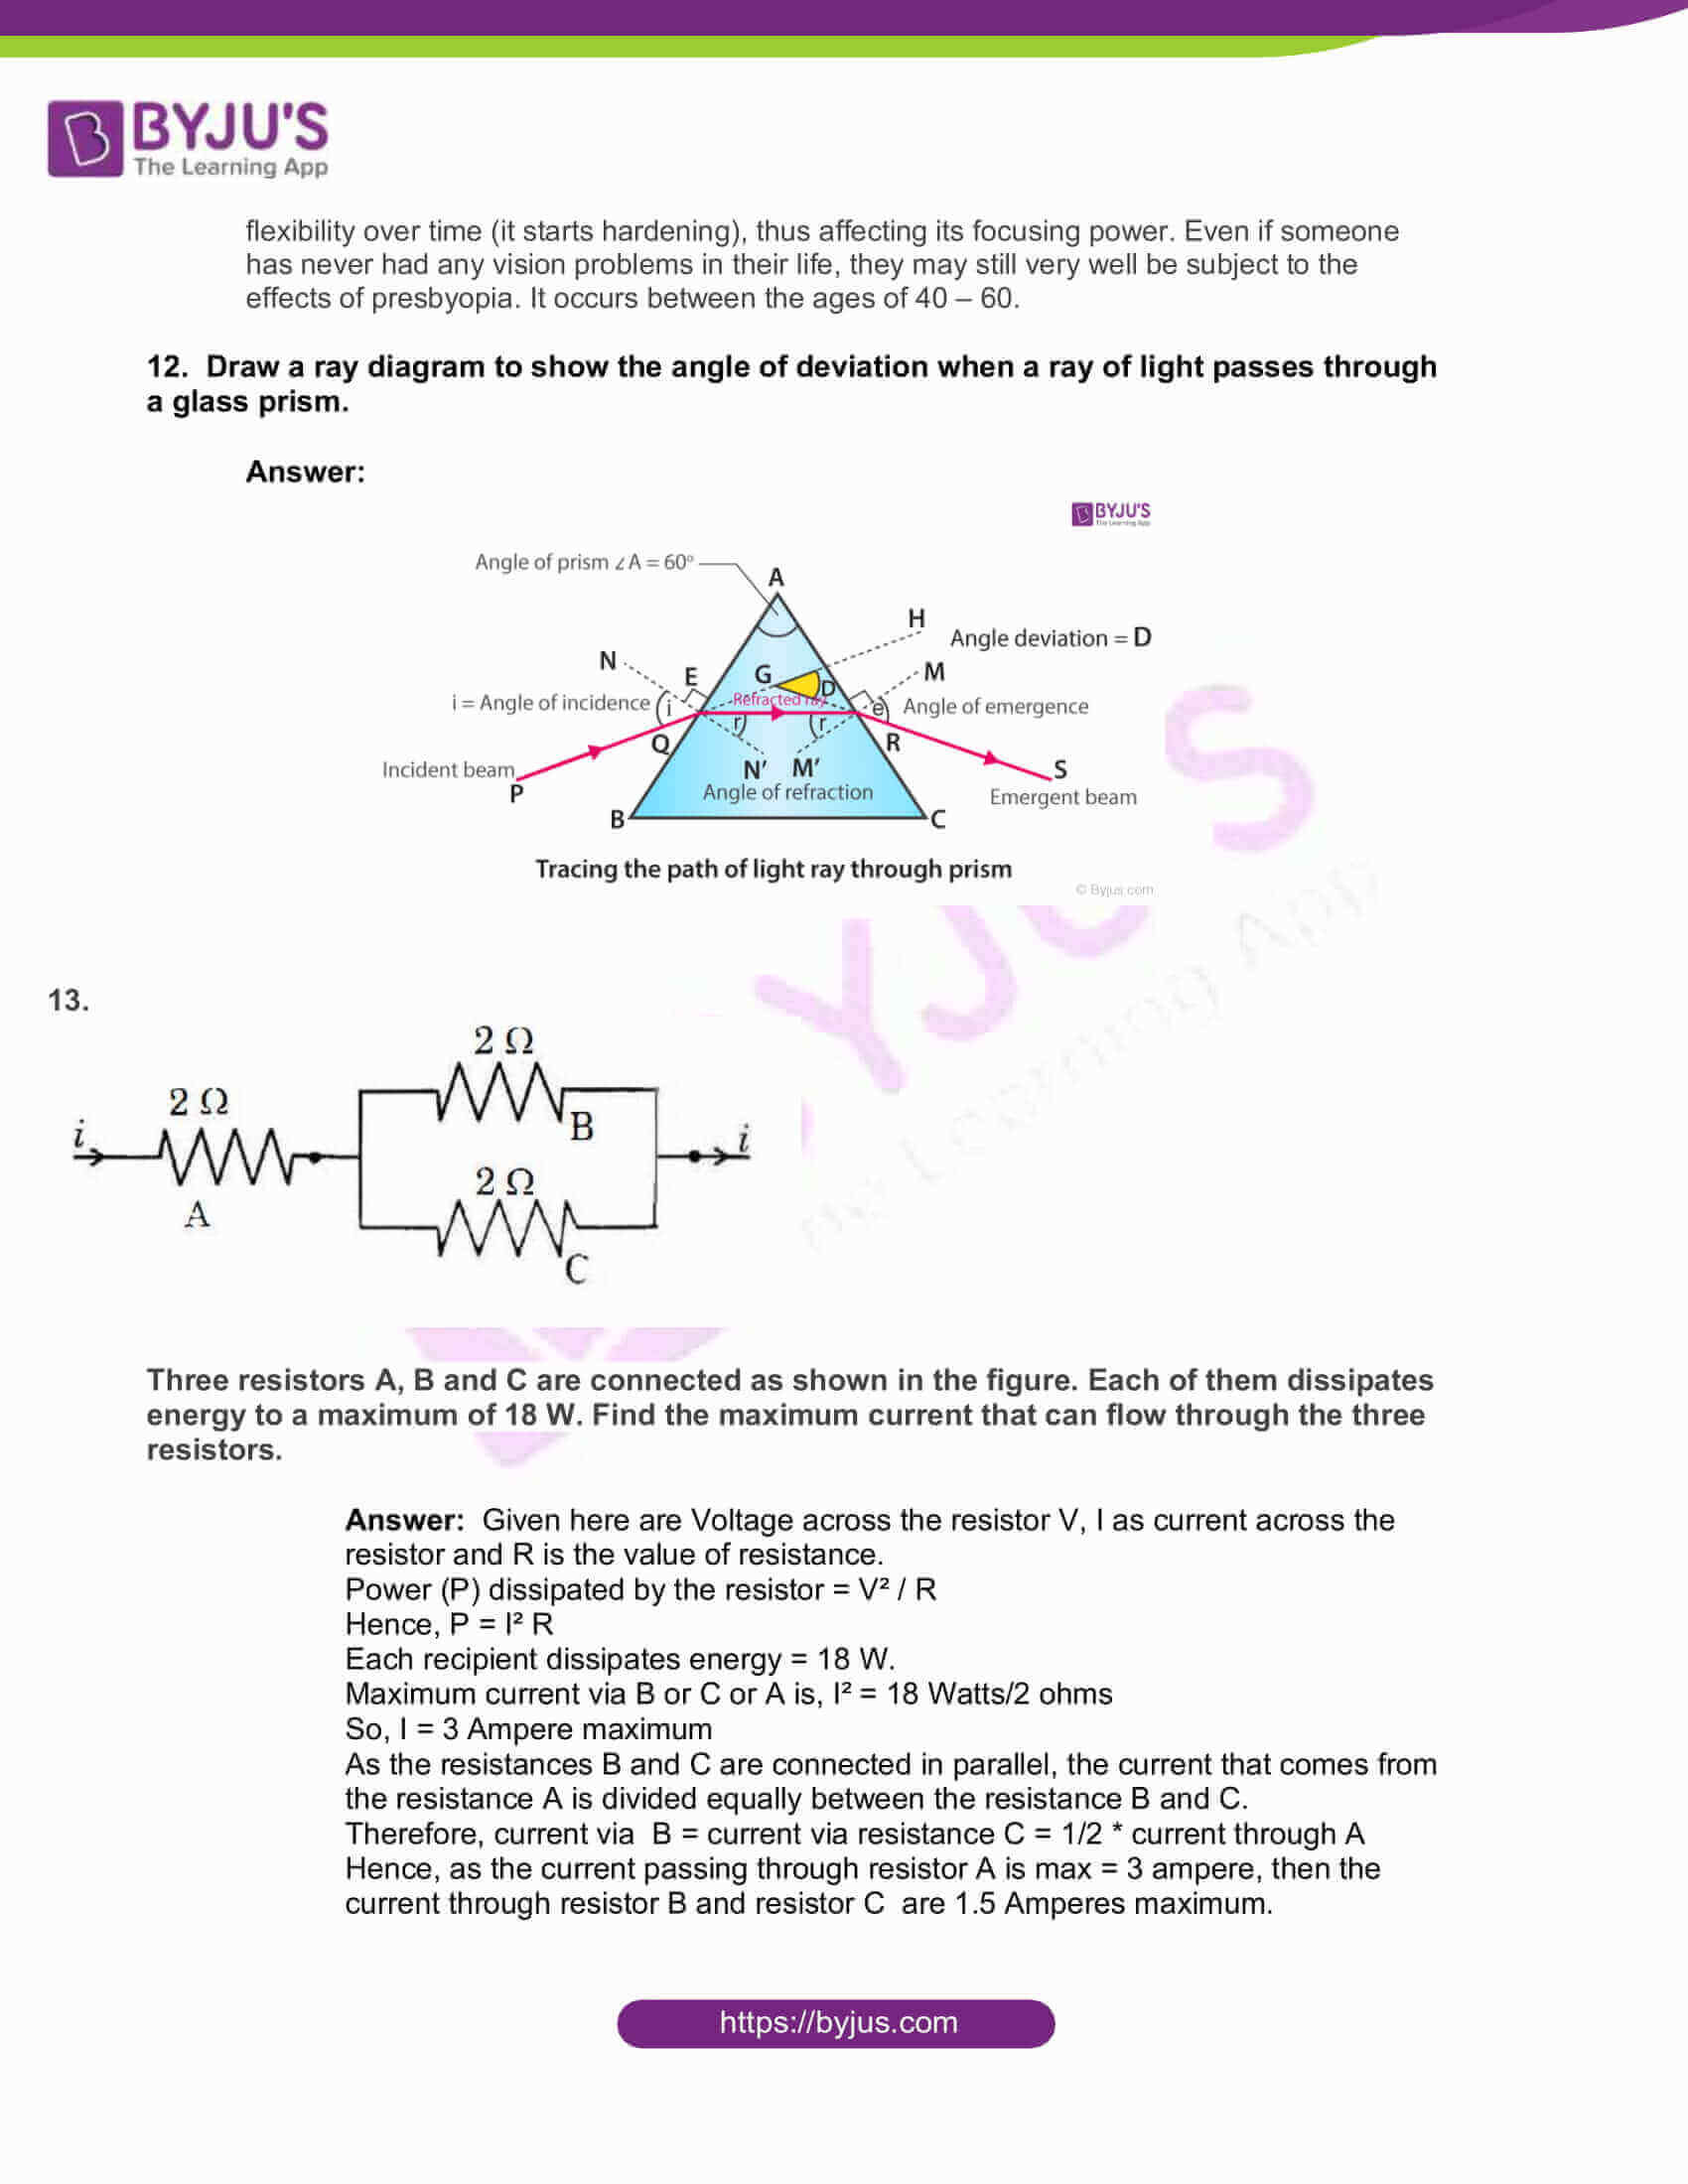 telangana board nov2020 class 10 science part i solutions 2015 06